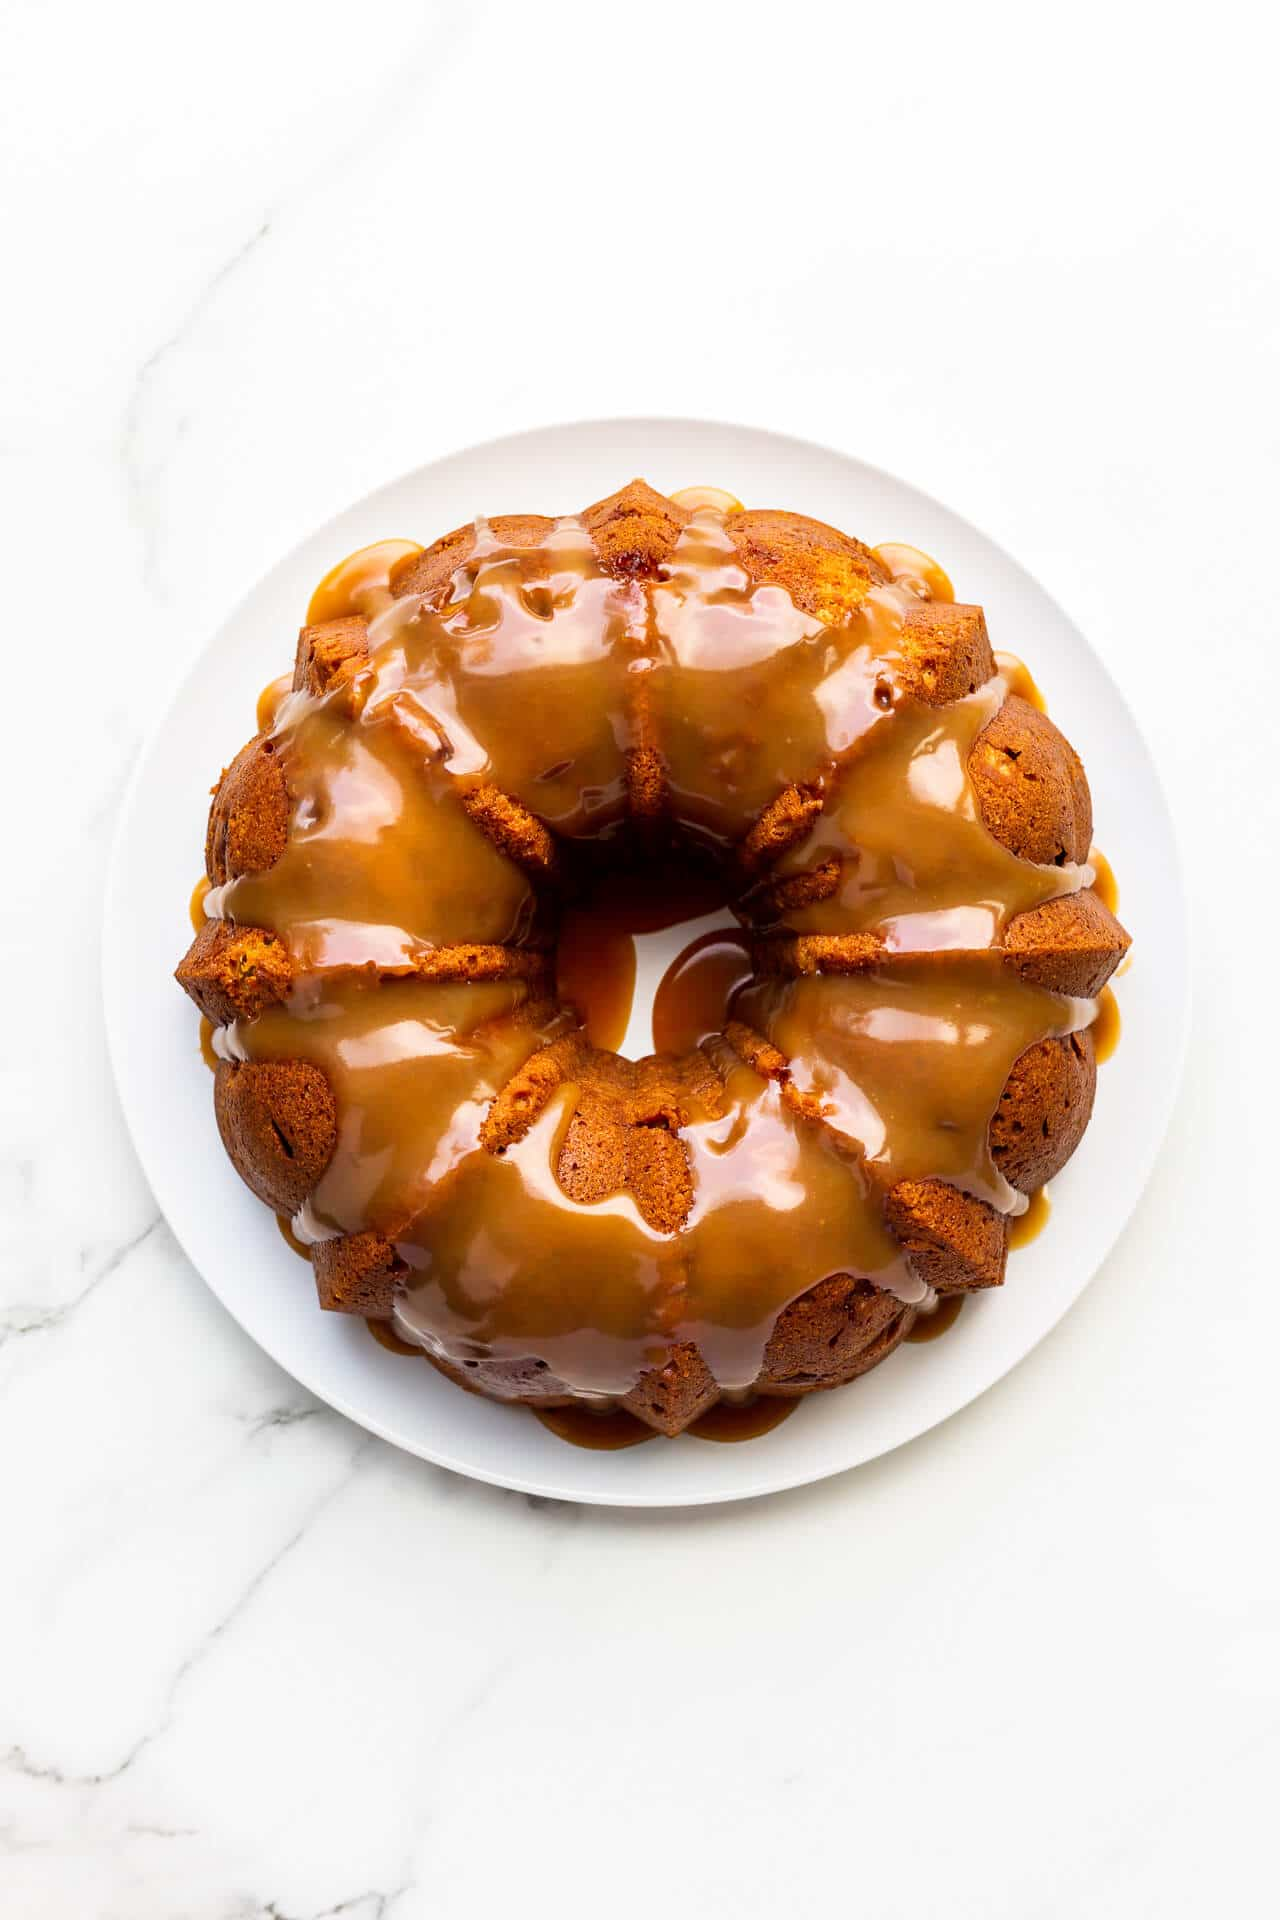 Bundt cake coated with shiny salted caramel sauce